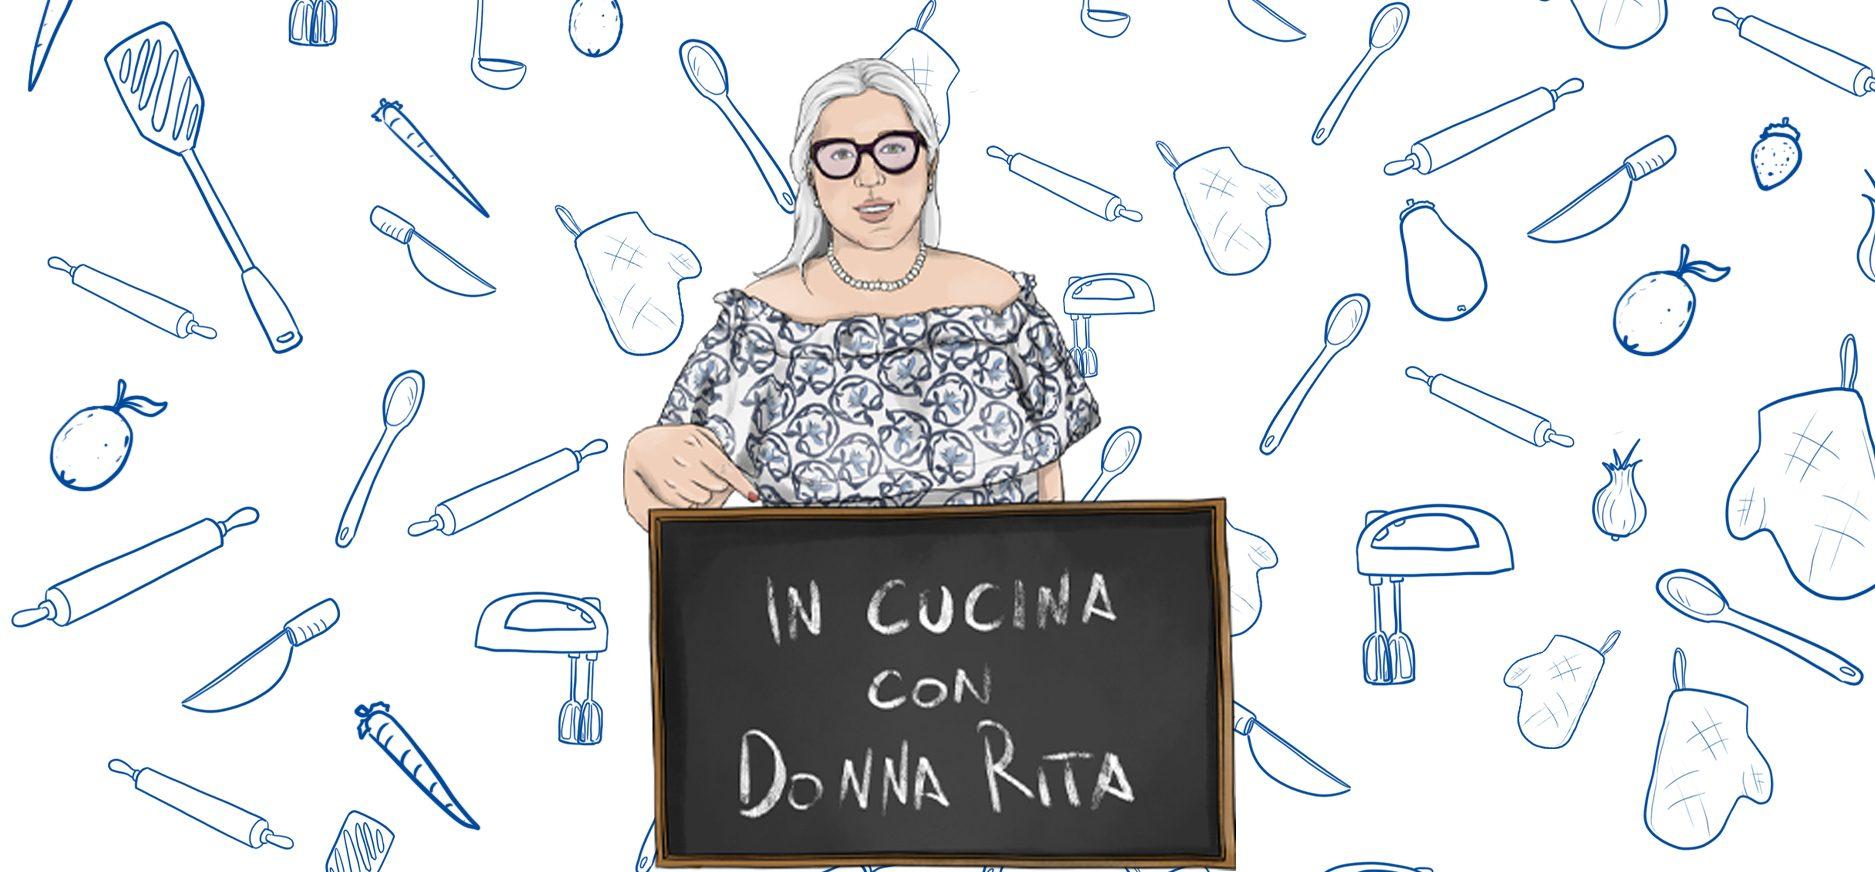 In cucina con Donna Rita